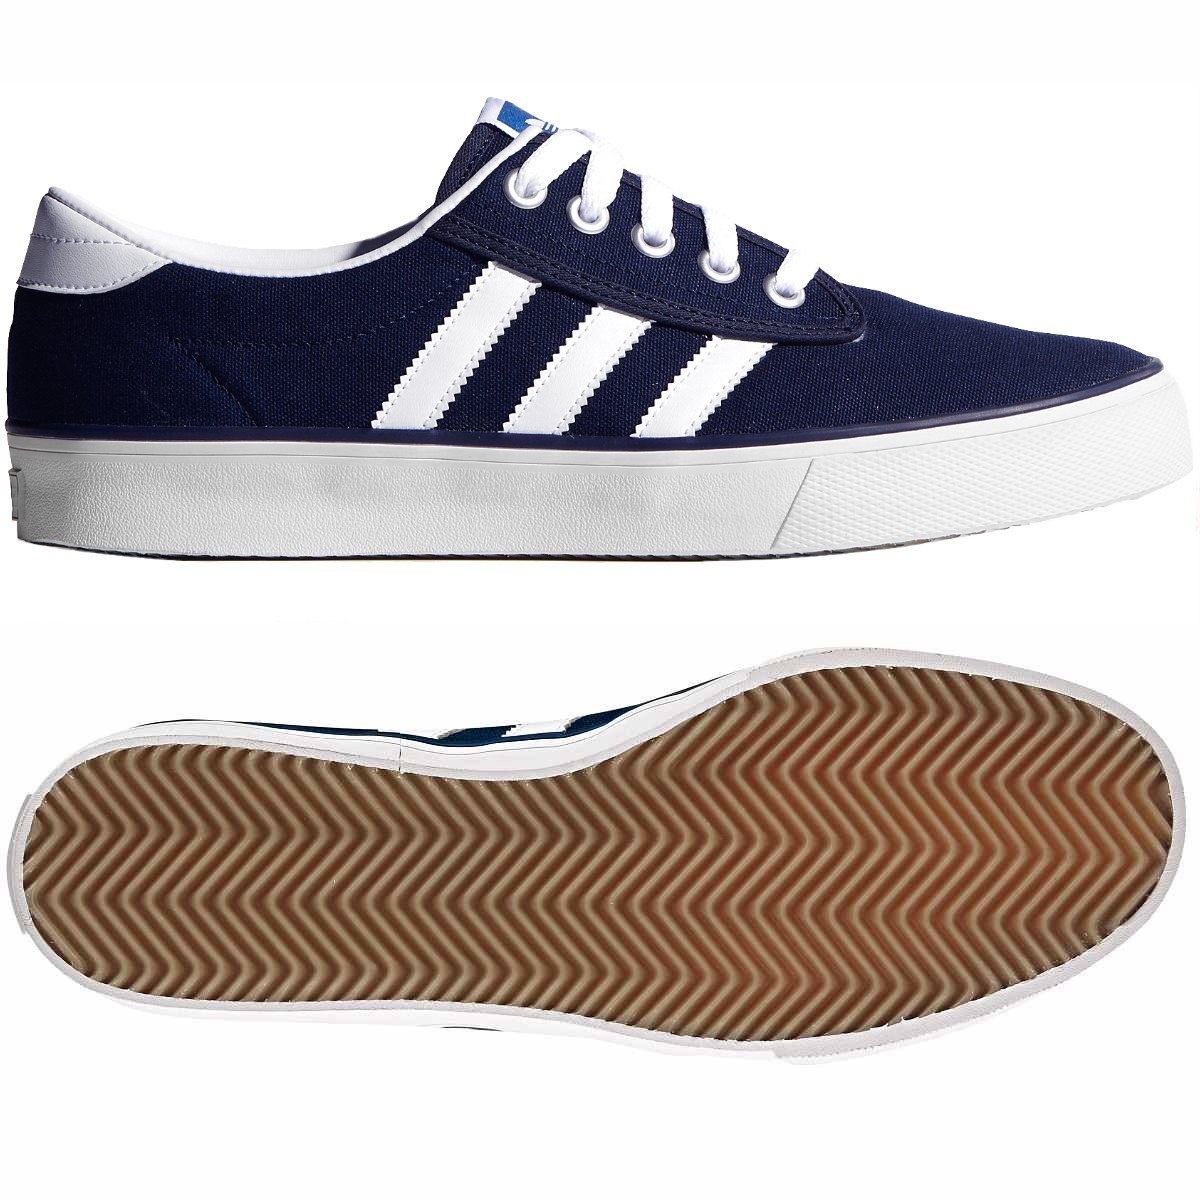 adidas originals adi kiel herren damen schuhe sneaker. Black Bedroom Furniture Sets. Home Design Ideas